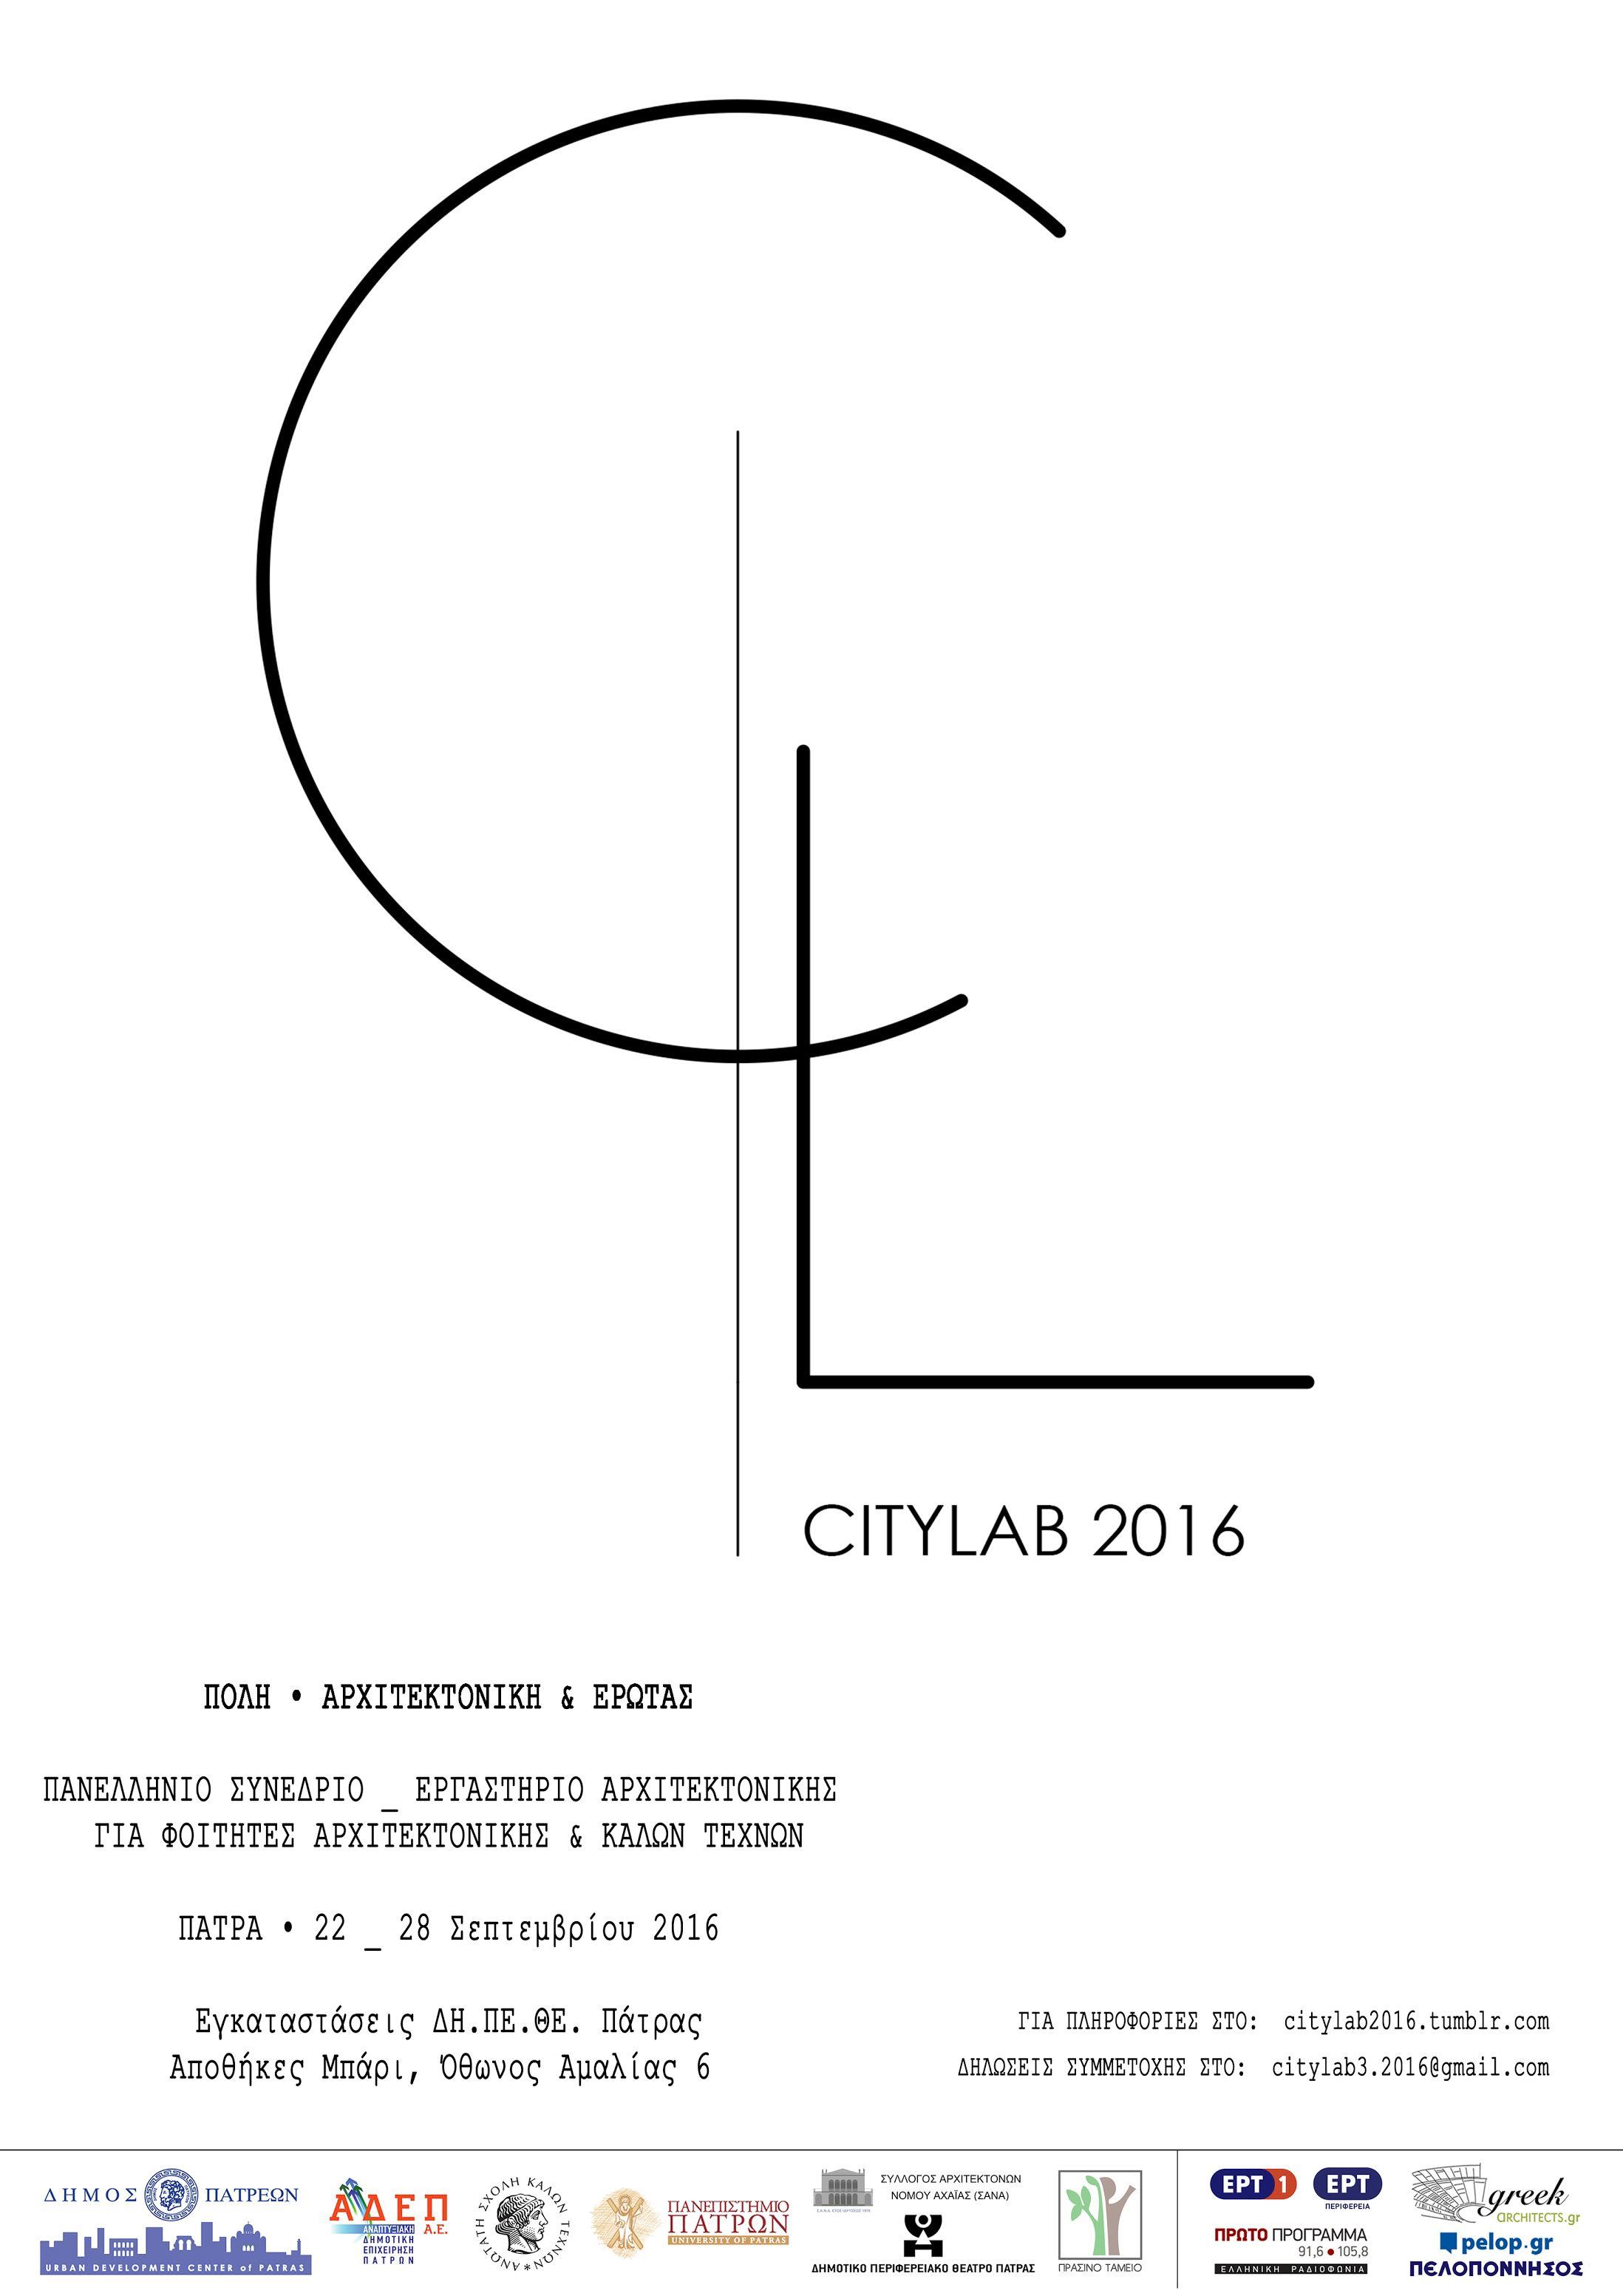 citylab_2016_poster